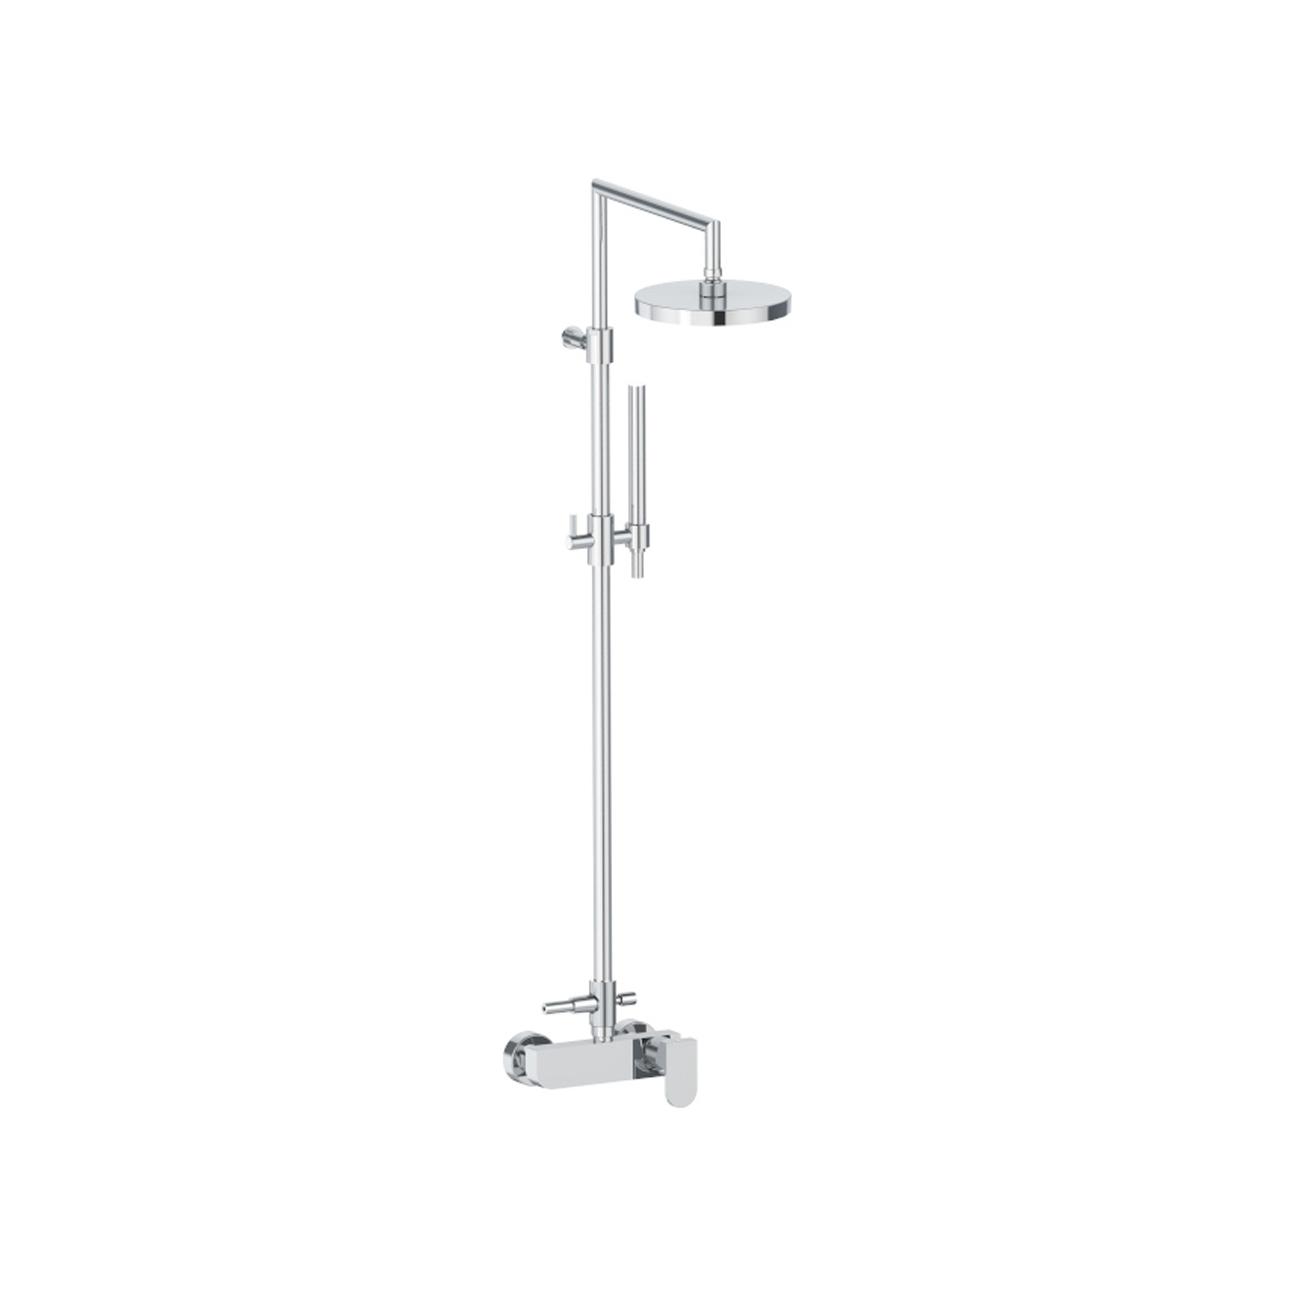 BELLOSTA BABY S 7209/5/1 Wall mounted shower mixer